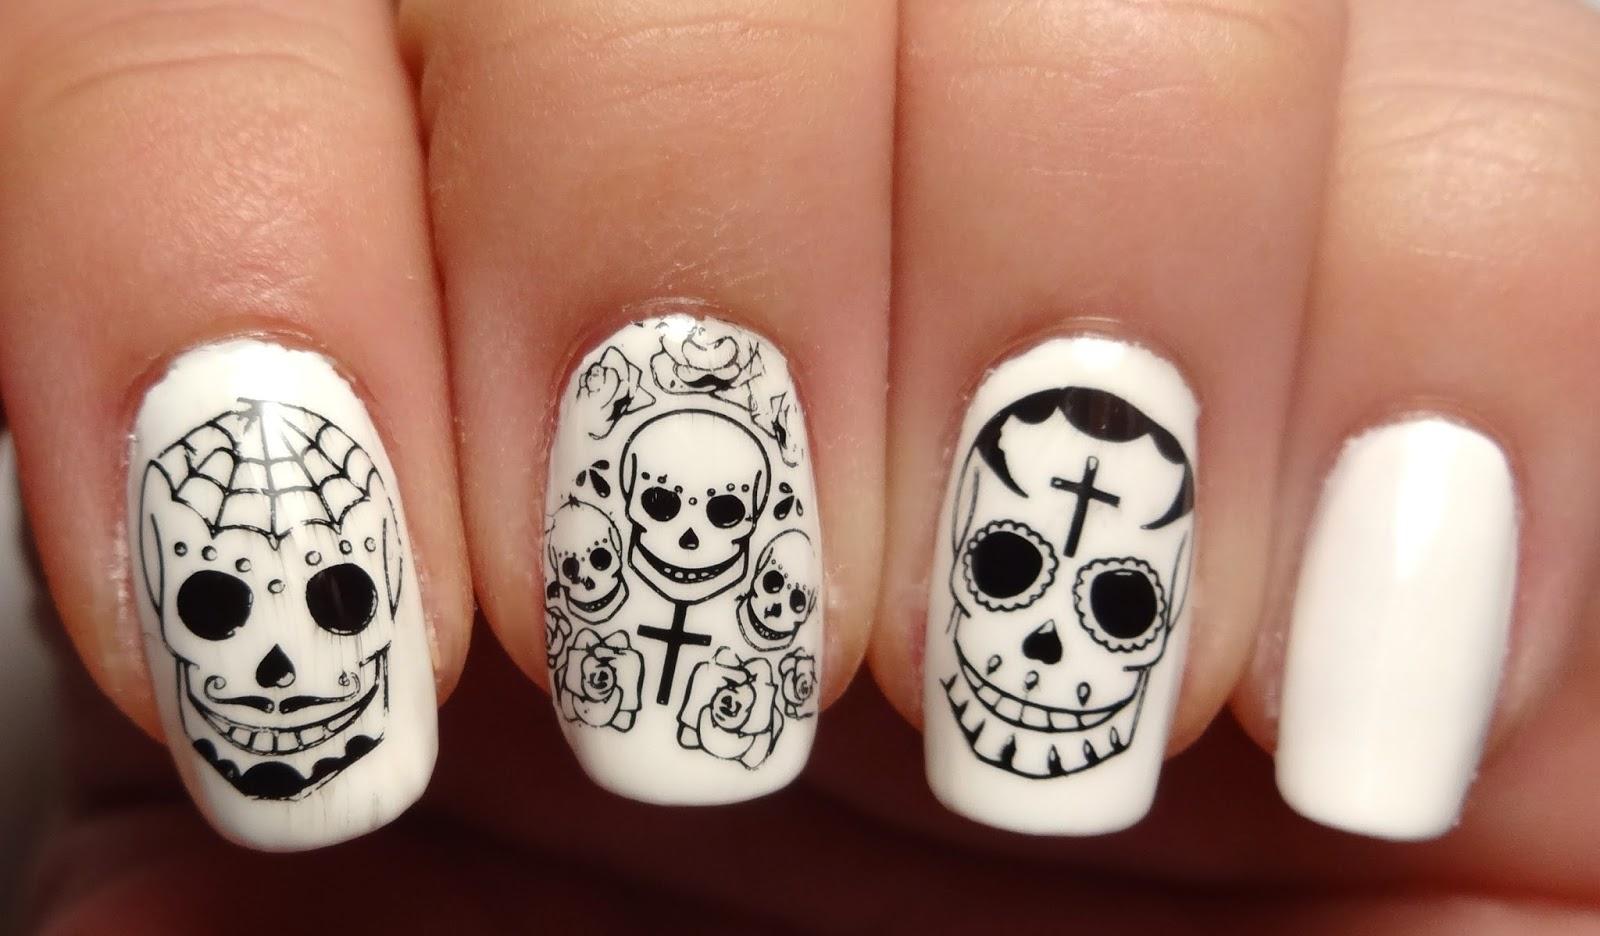 Skull Stamped Nails